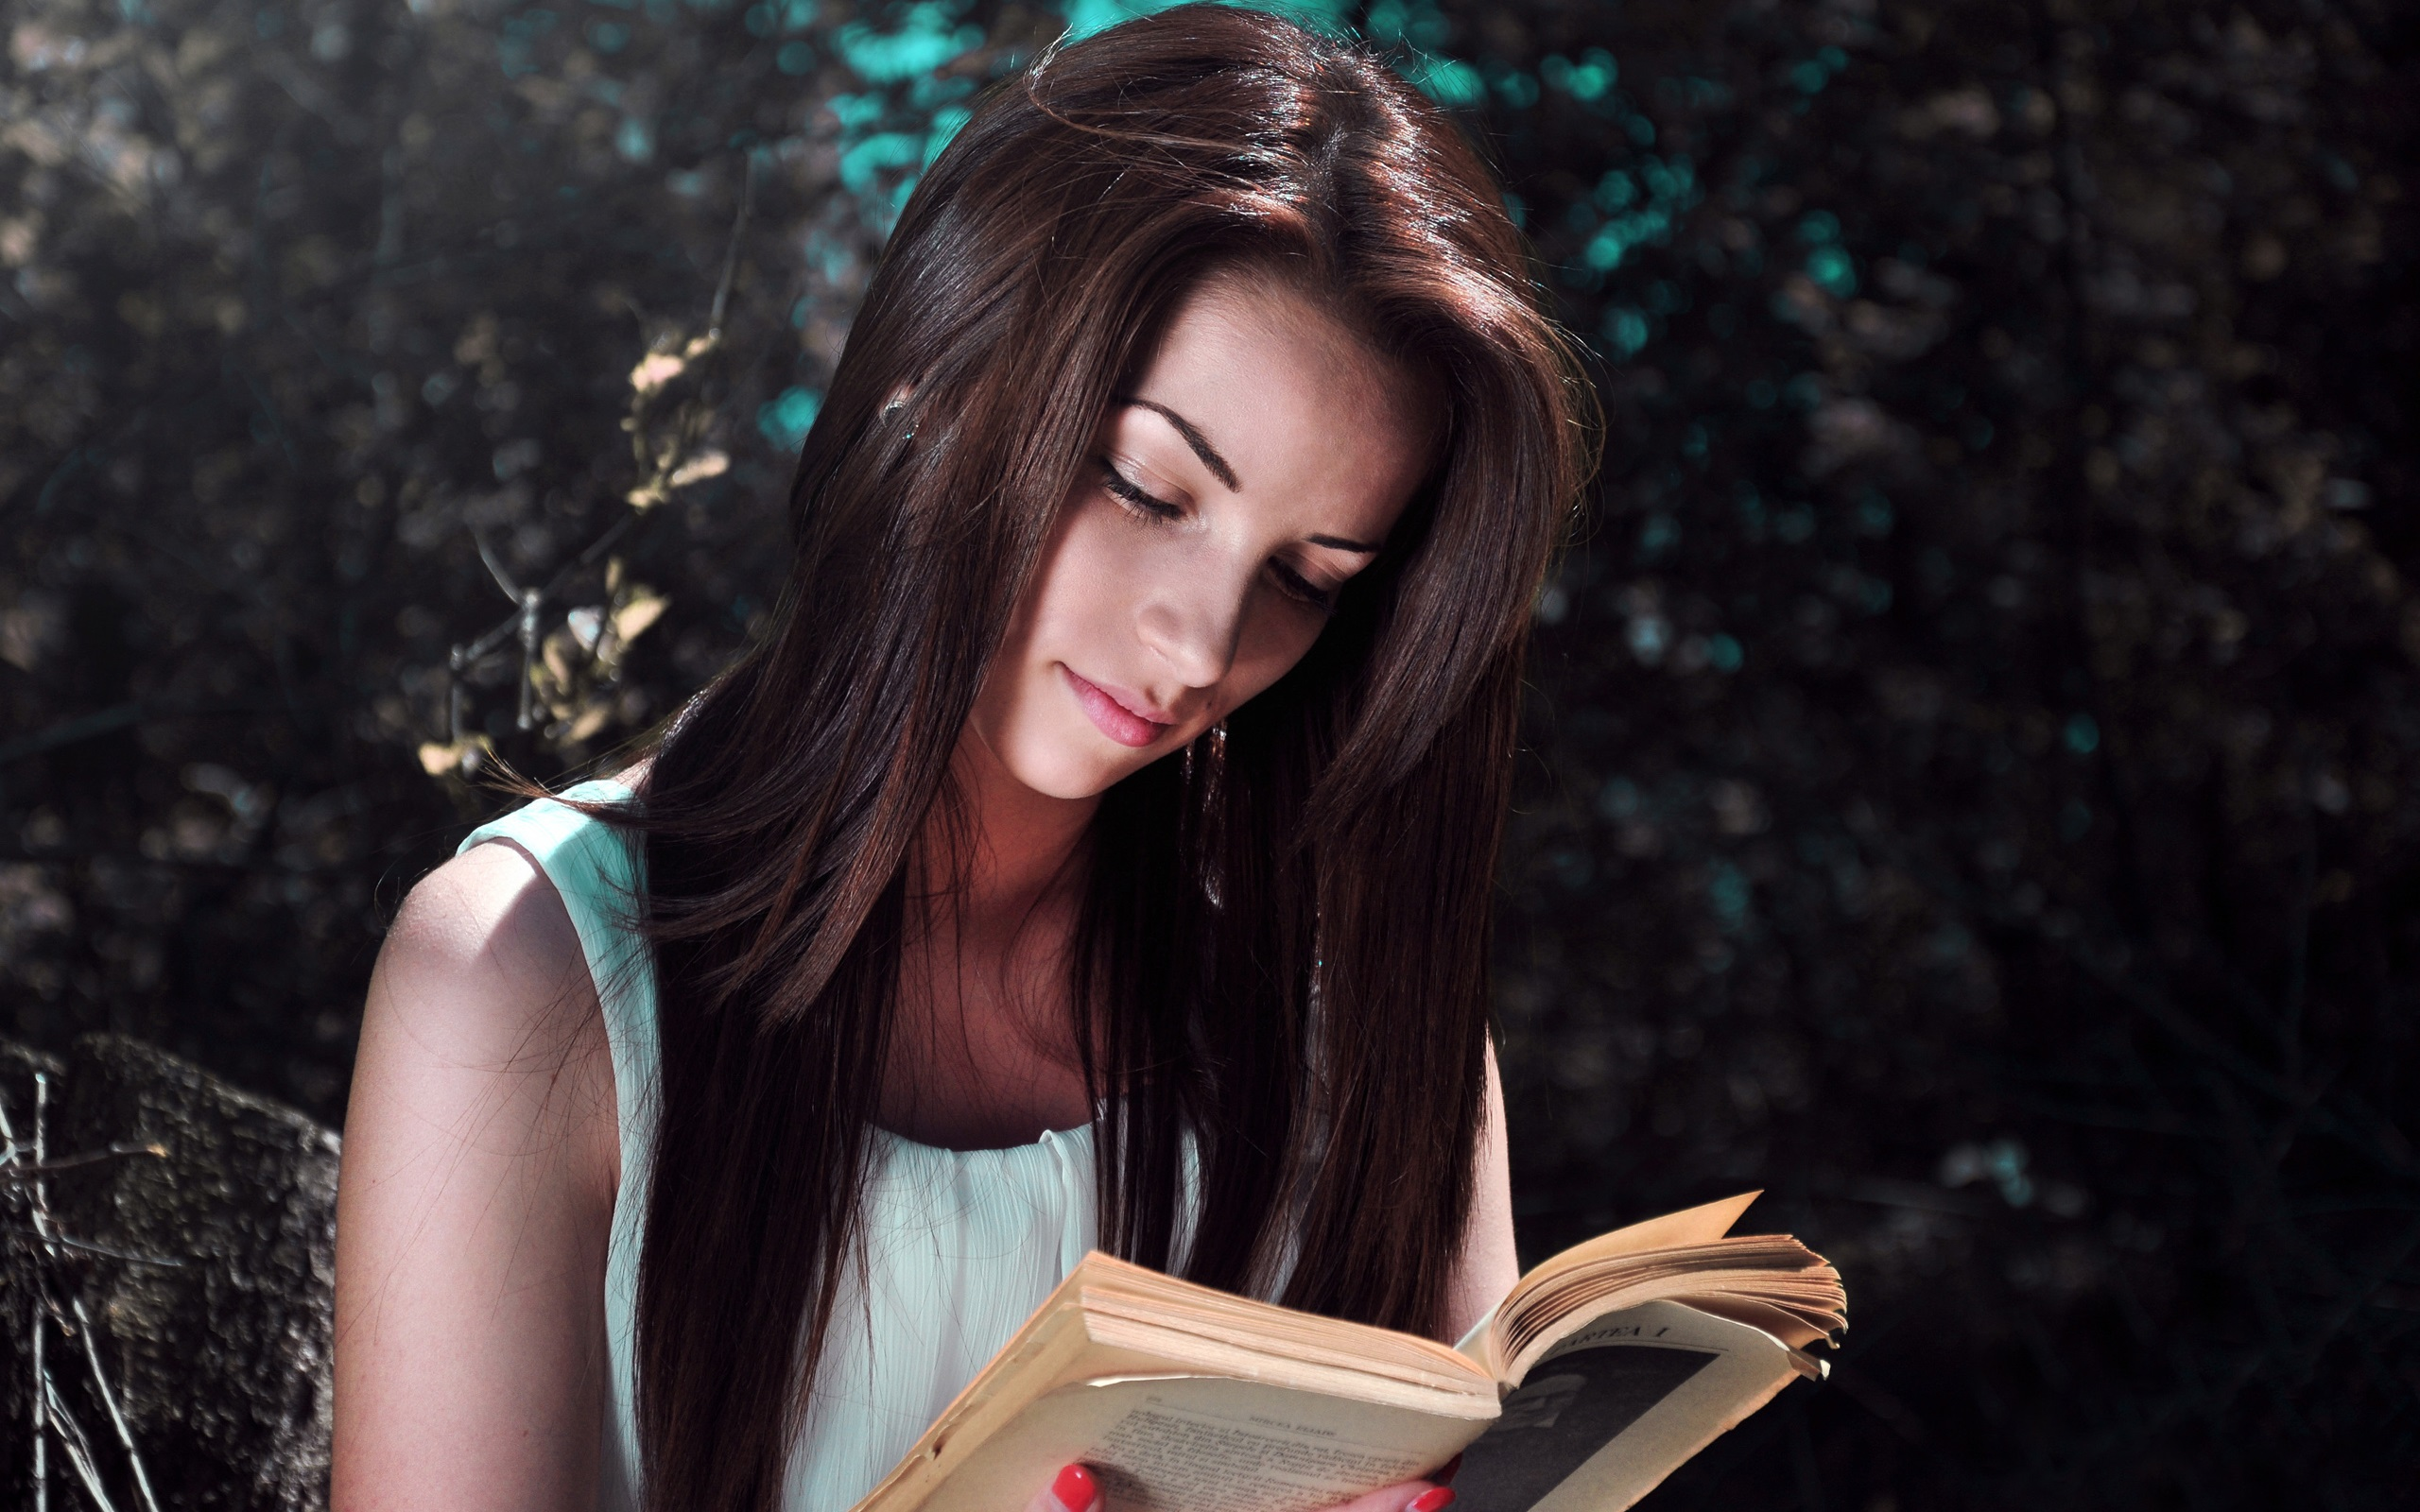 Wallpaper Girl Reading Book Sunlight 2560x1600 Hd Picture